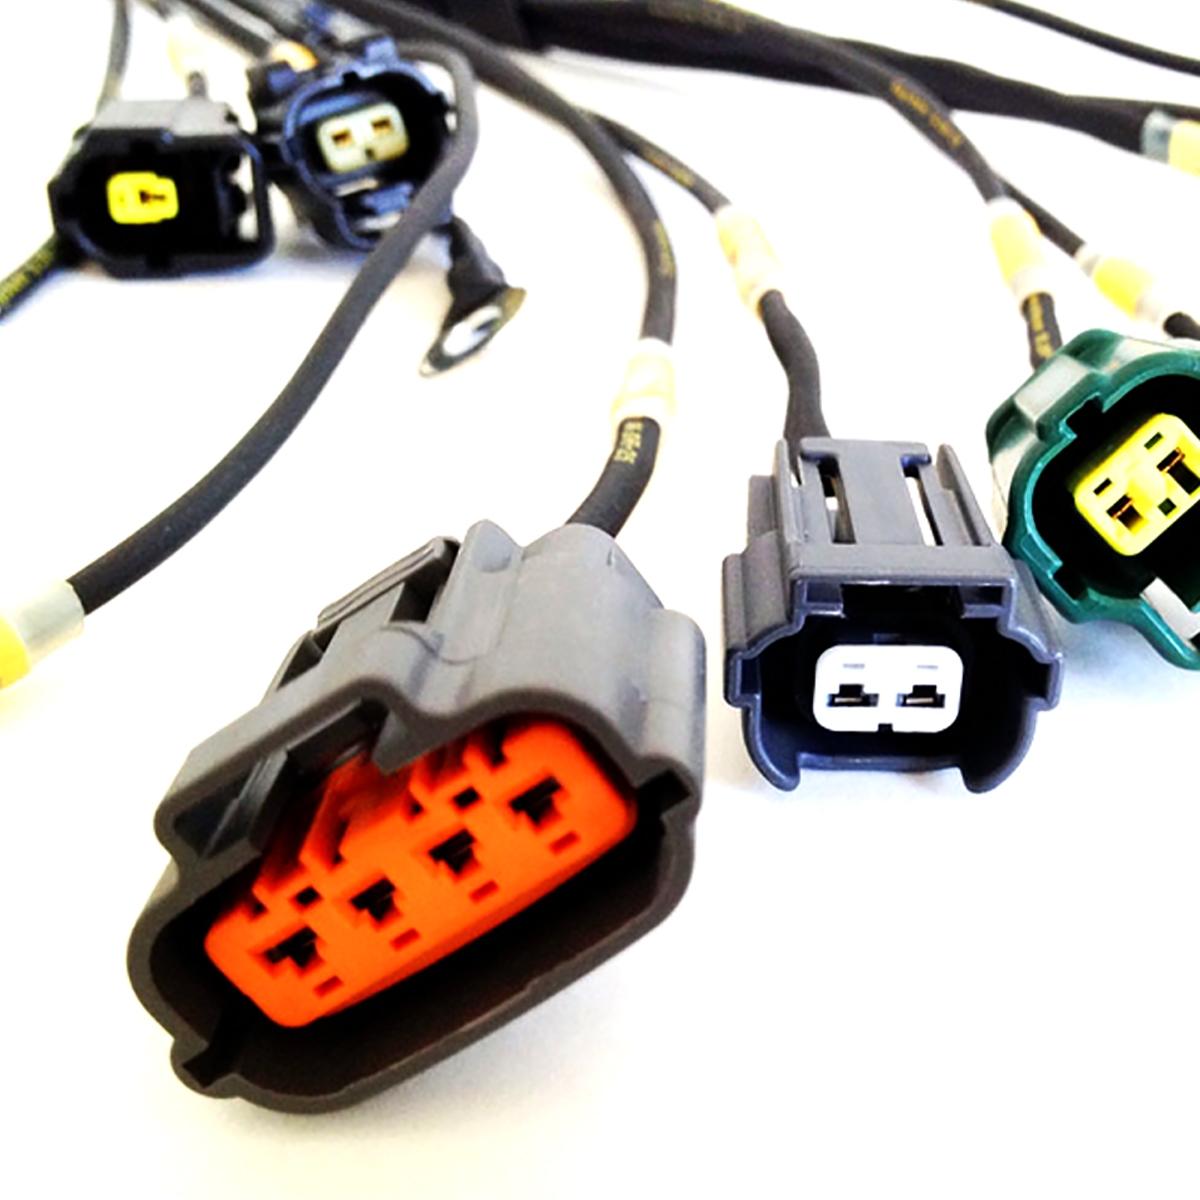 hight resolution of mil spec tucked 13b harness fd3s rx7 rx7 fd wiring harness diagram rx7 wiring harness